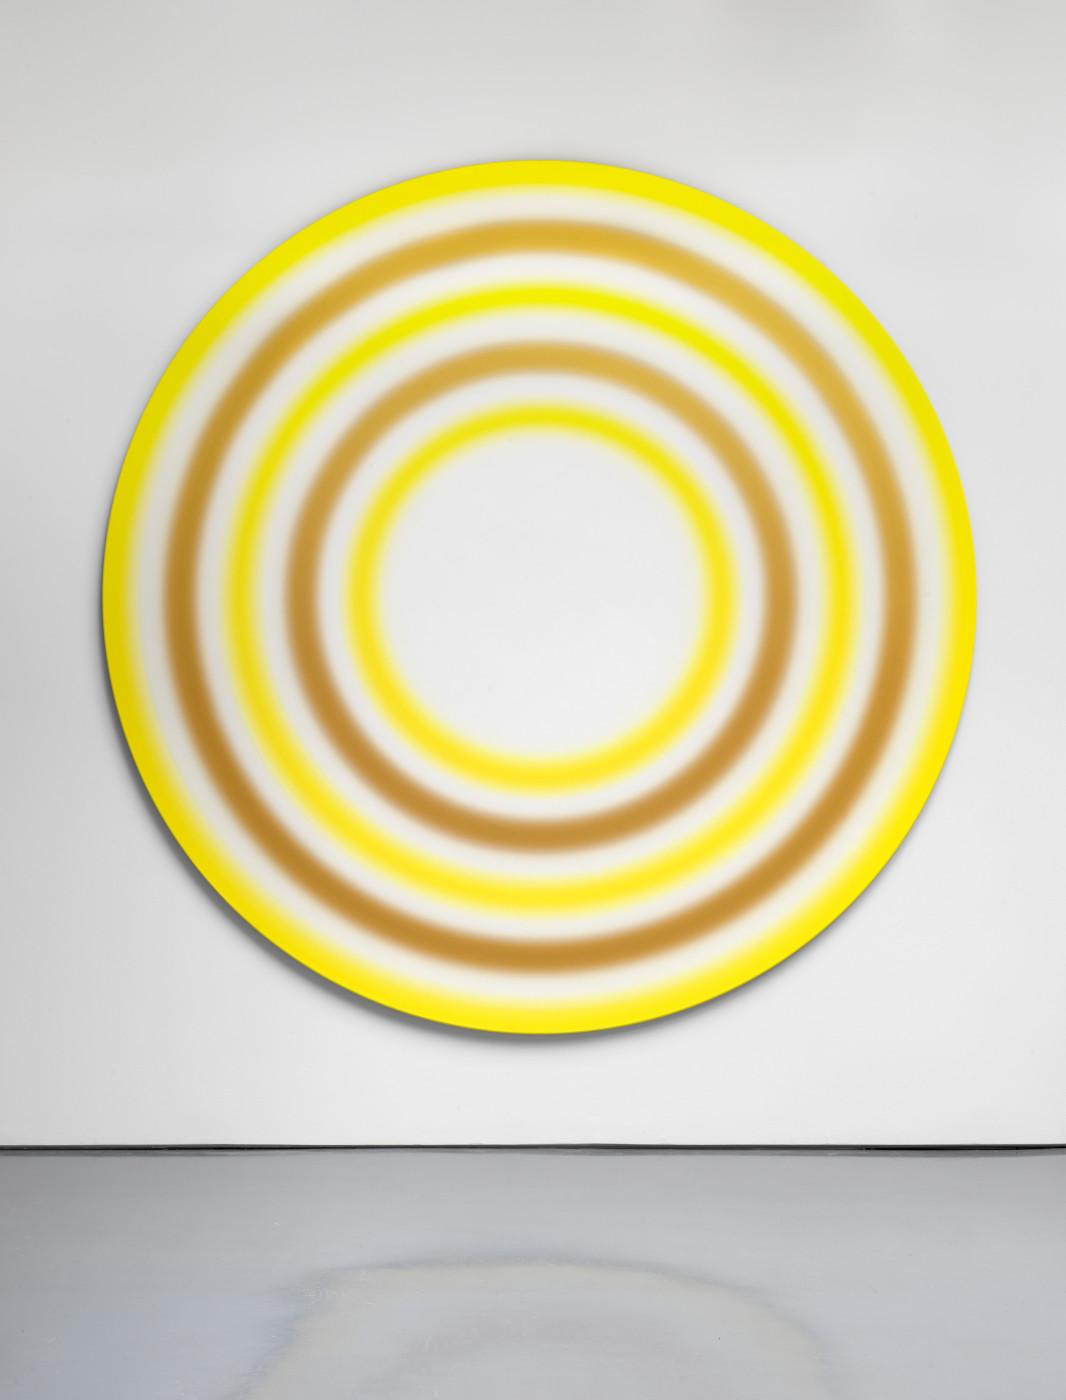 "<div class=""title""><em>ACHTZEHNTERJULIZWEITAUSENDUNDZWÖLF</em>, 2012</div><div class=""medium"">acrylic on canvas, plexiglass plaque with caption</div><div class=""dimensions"">diam: 270 cm / 106 ¼ in<br />depth: 3.2 cm / 1 ¼ in</div>"